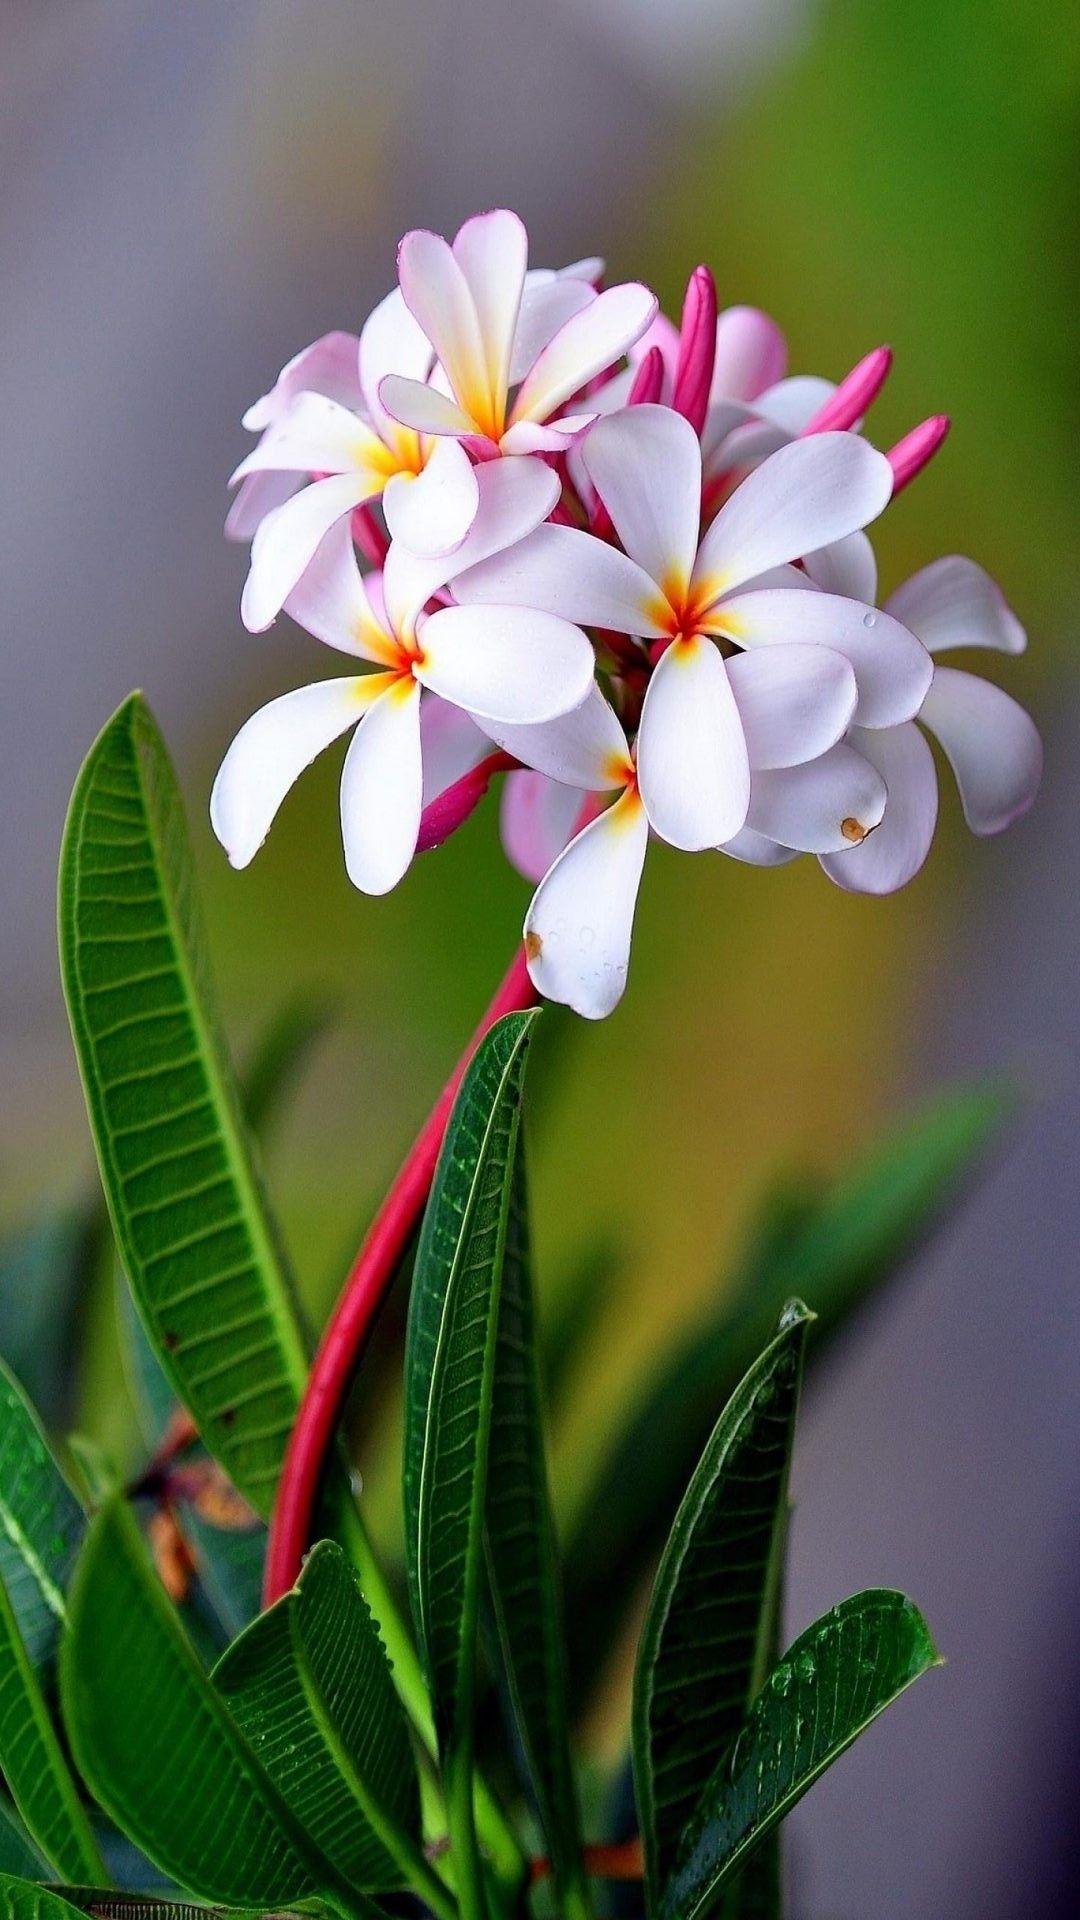 Wallpaper White Flower Mobile Best Hd Wallpapers Beautiful Flowers Plumeria Flowers Amazing Flowers